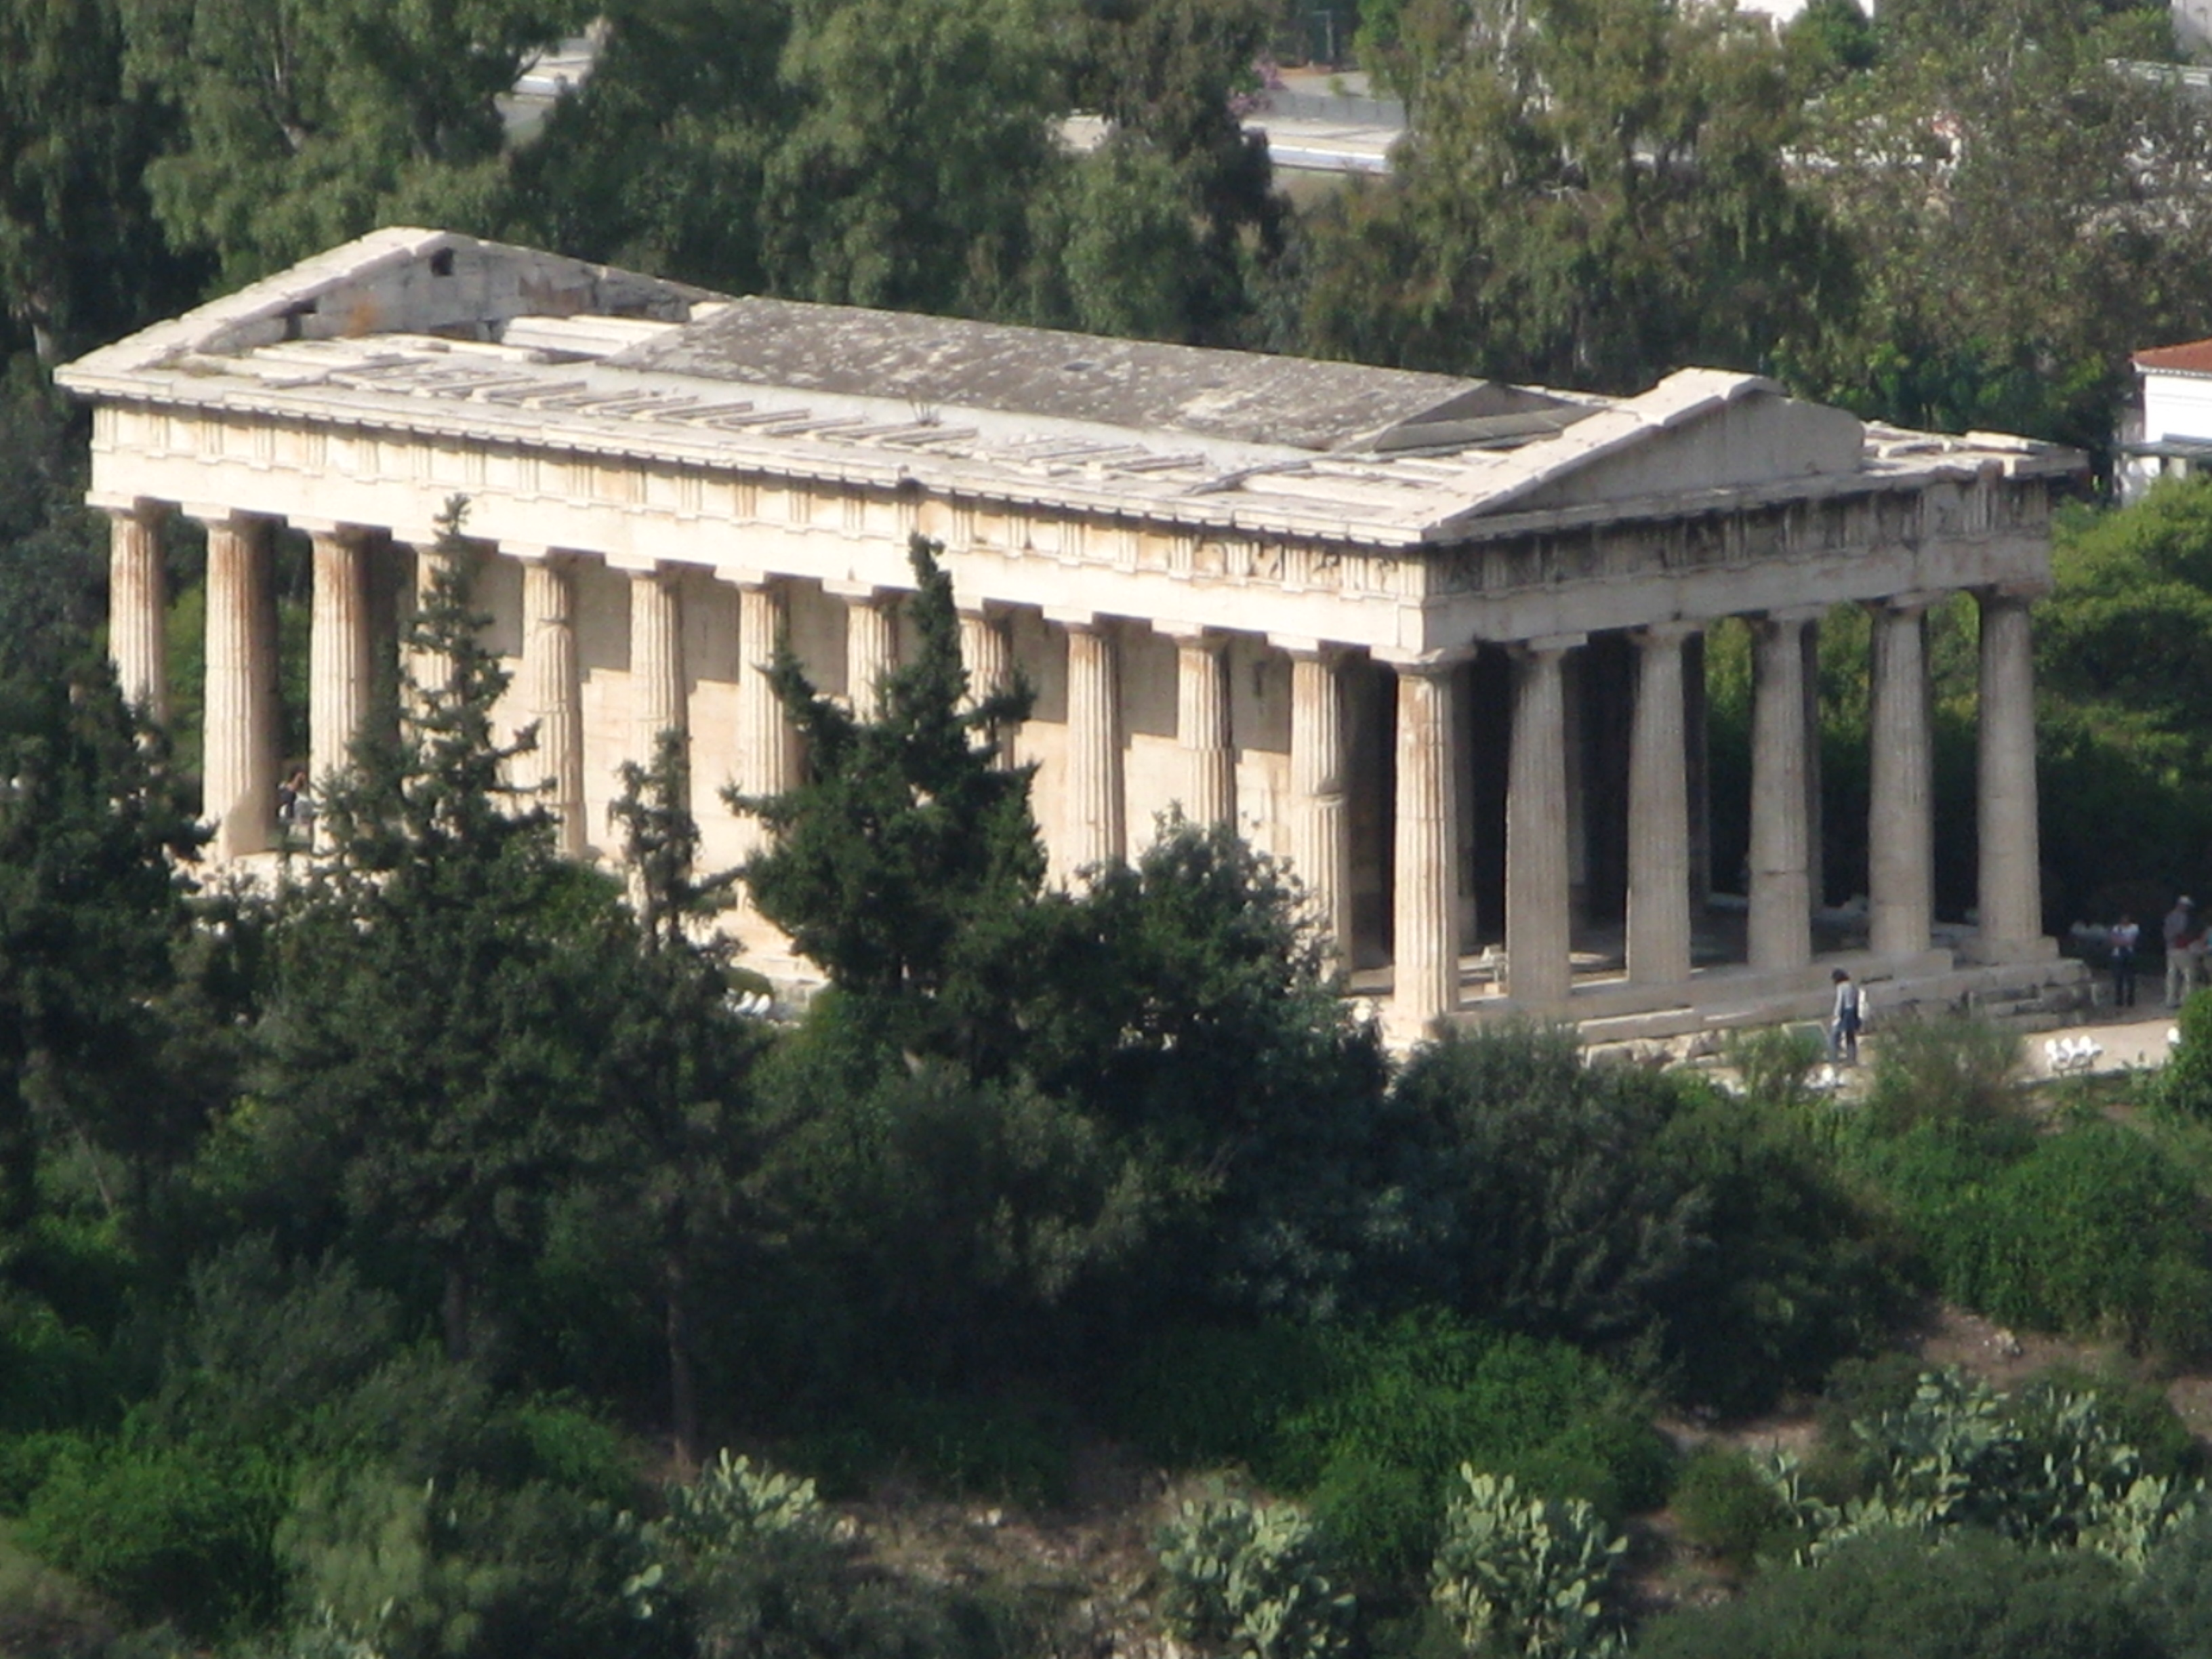 File:Temple of Hephaestus-Athens.jpg - Wikimedia Commons